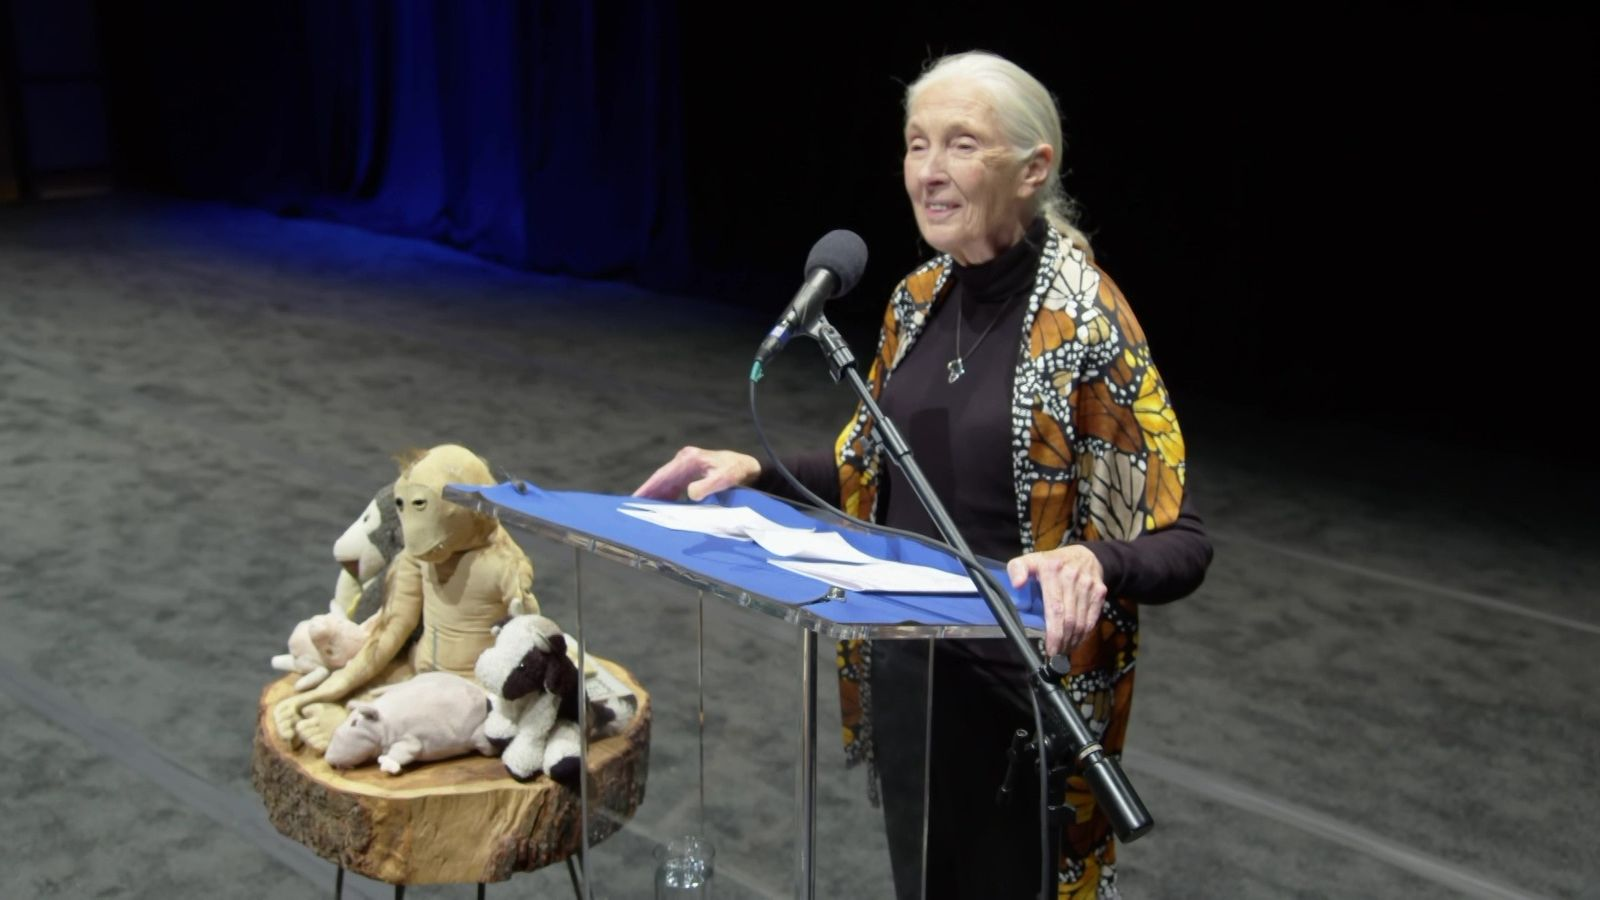 Palestra da Dra. Jane Goodall